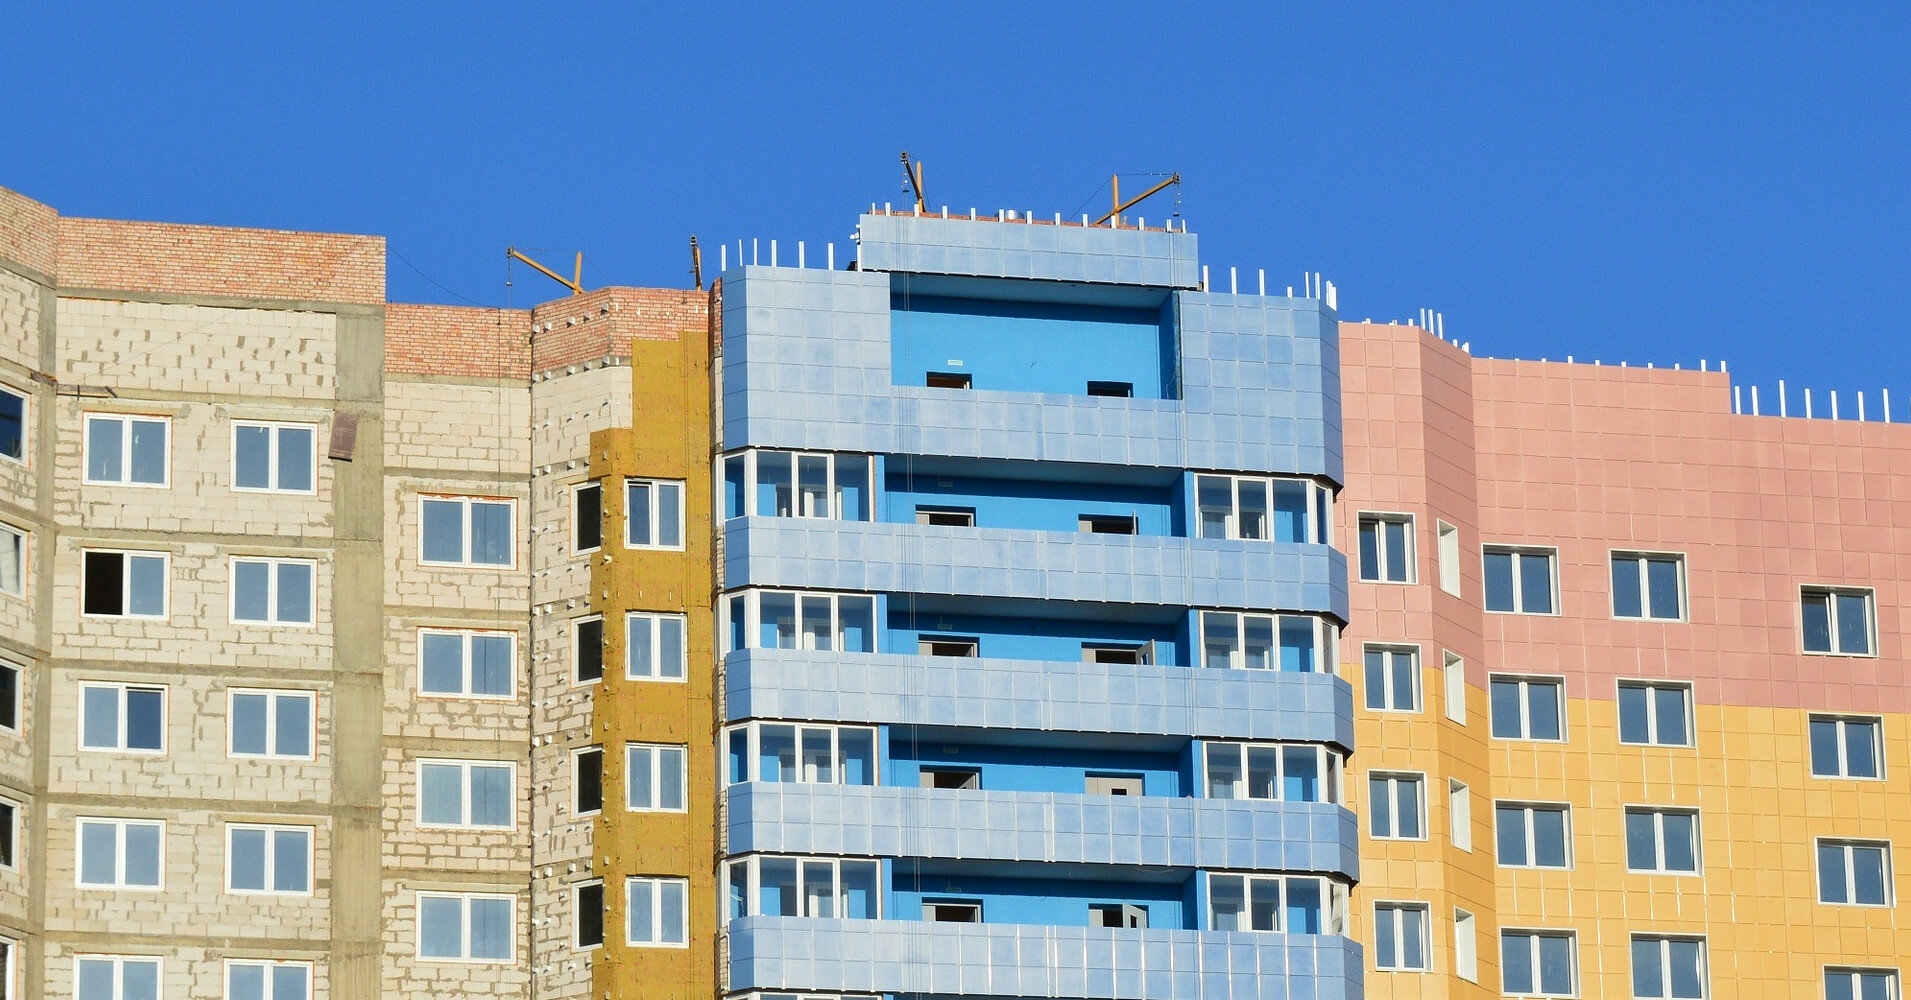 Цены на квартиры поднимут вслед за подорожанием риелторских услуг